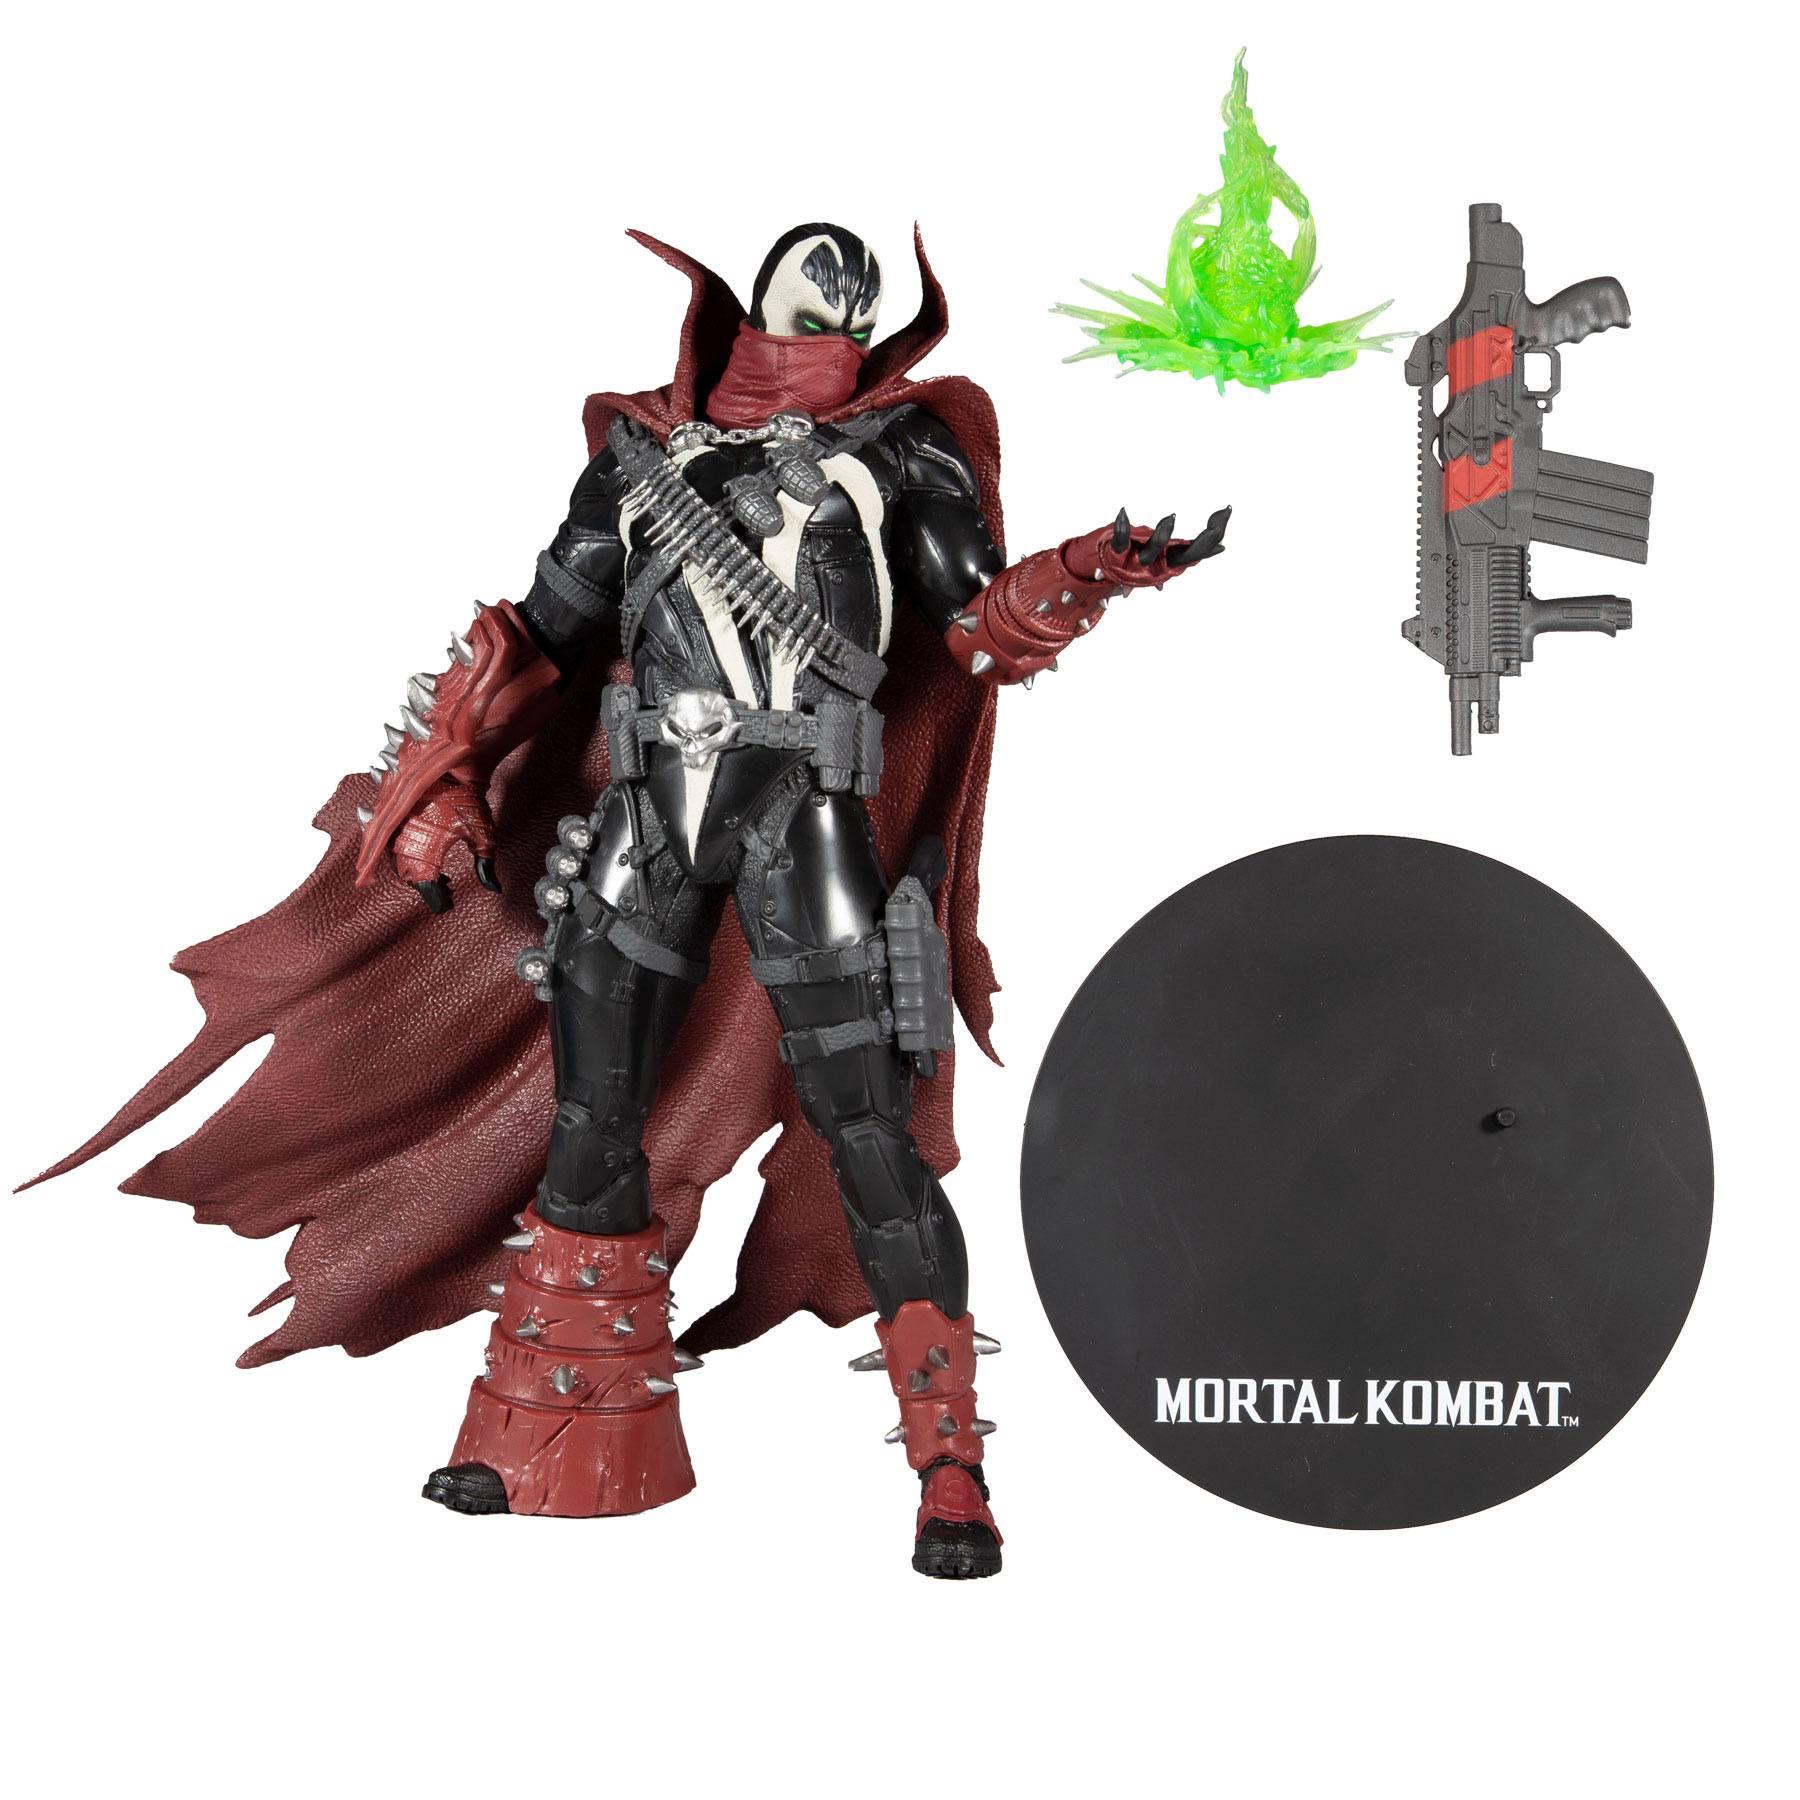 Mortal Kombat Actionfigur Commando Spawn - Dark Ages Skin 30 cm MCF11052-4 787926110524